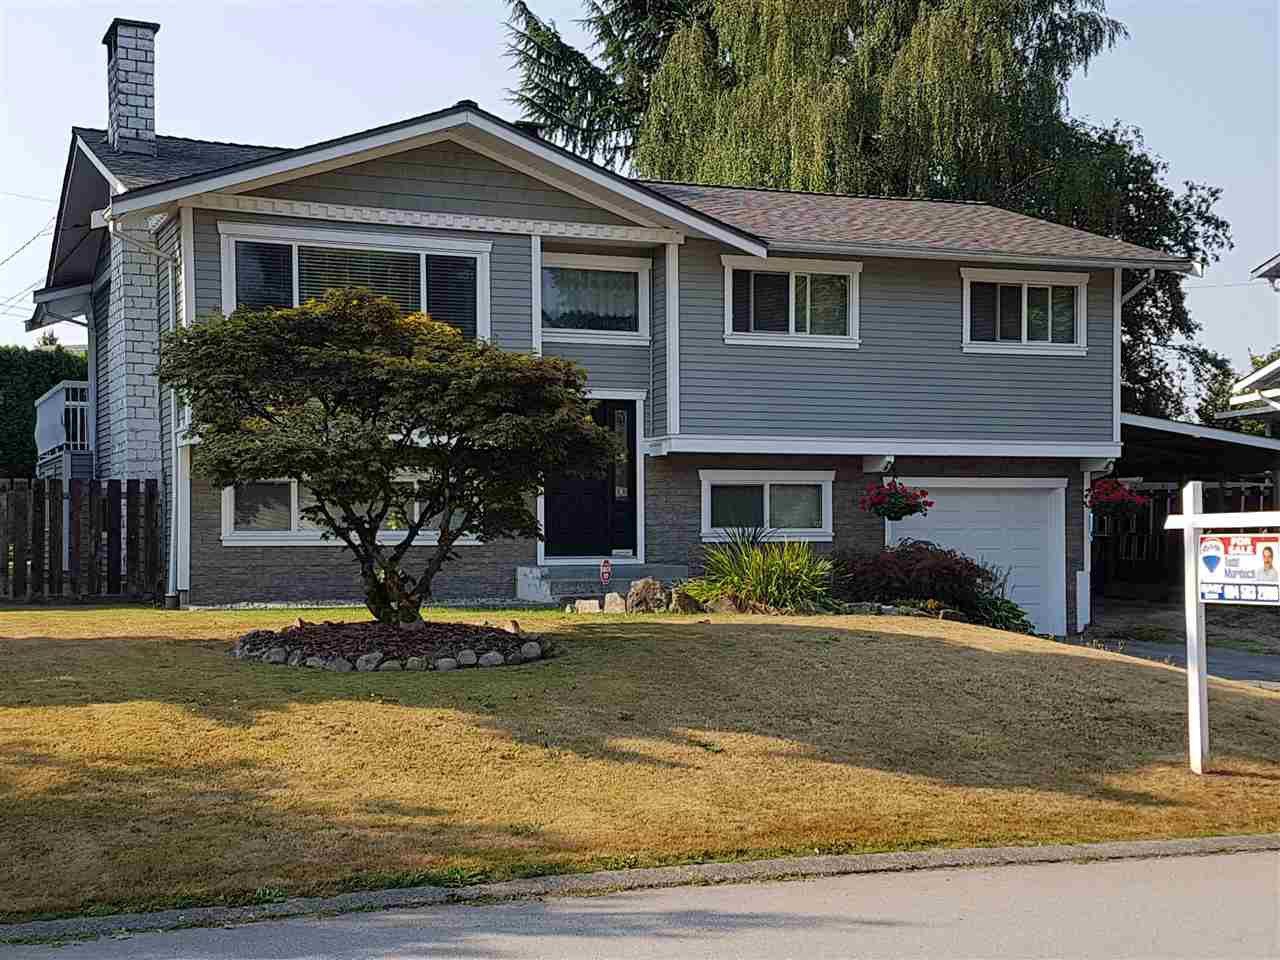 "Main Photo: 11065 SWAN Crescent in Surrey: Bolivar Heights House for sale in ""birdland"" (North Surrey)  : MLS®# R2300168"